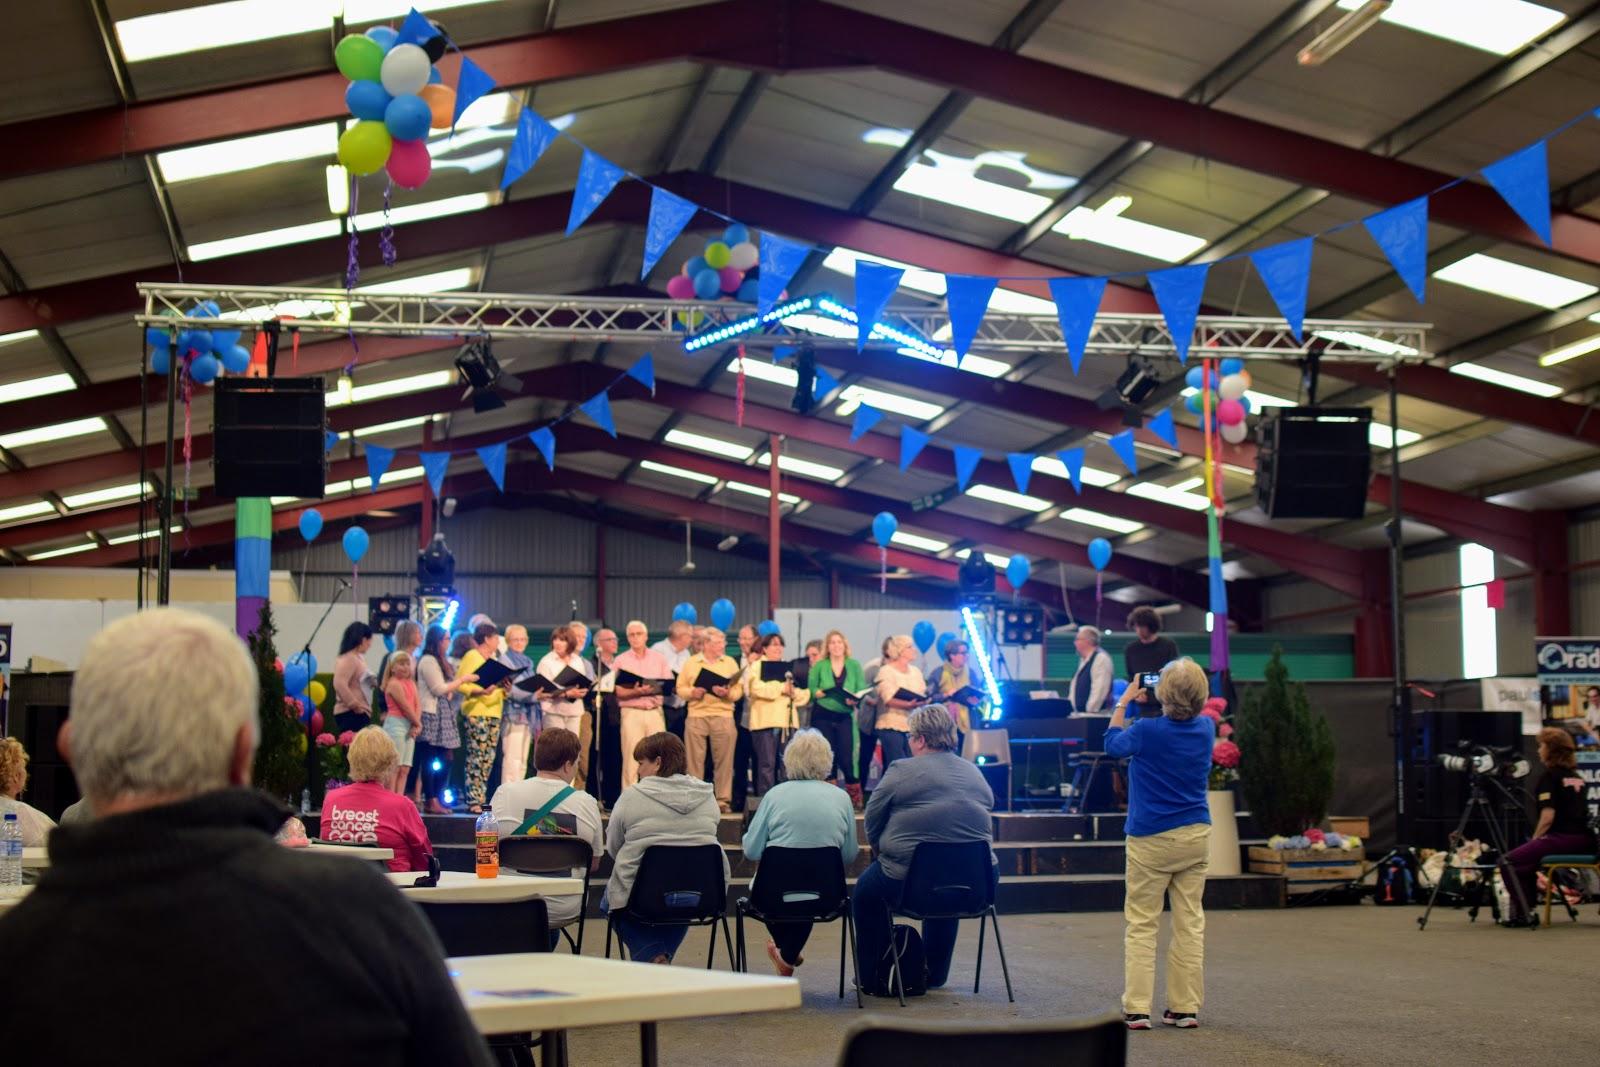 , Festival of Hope 2017, Carew, Pembrokeshire